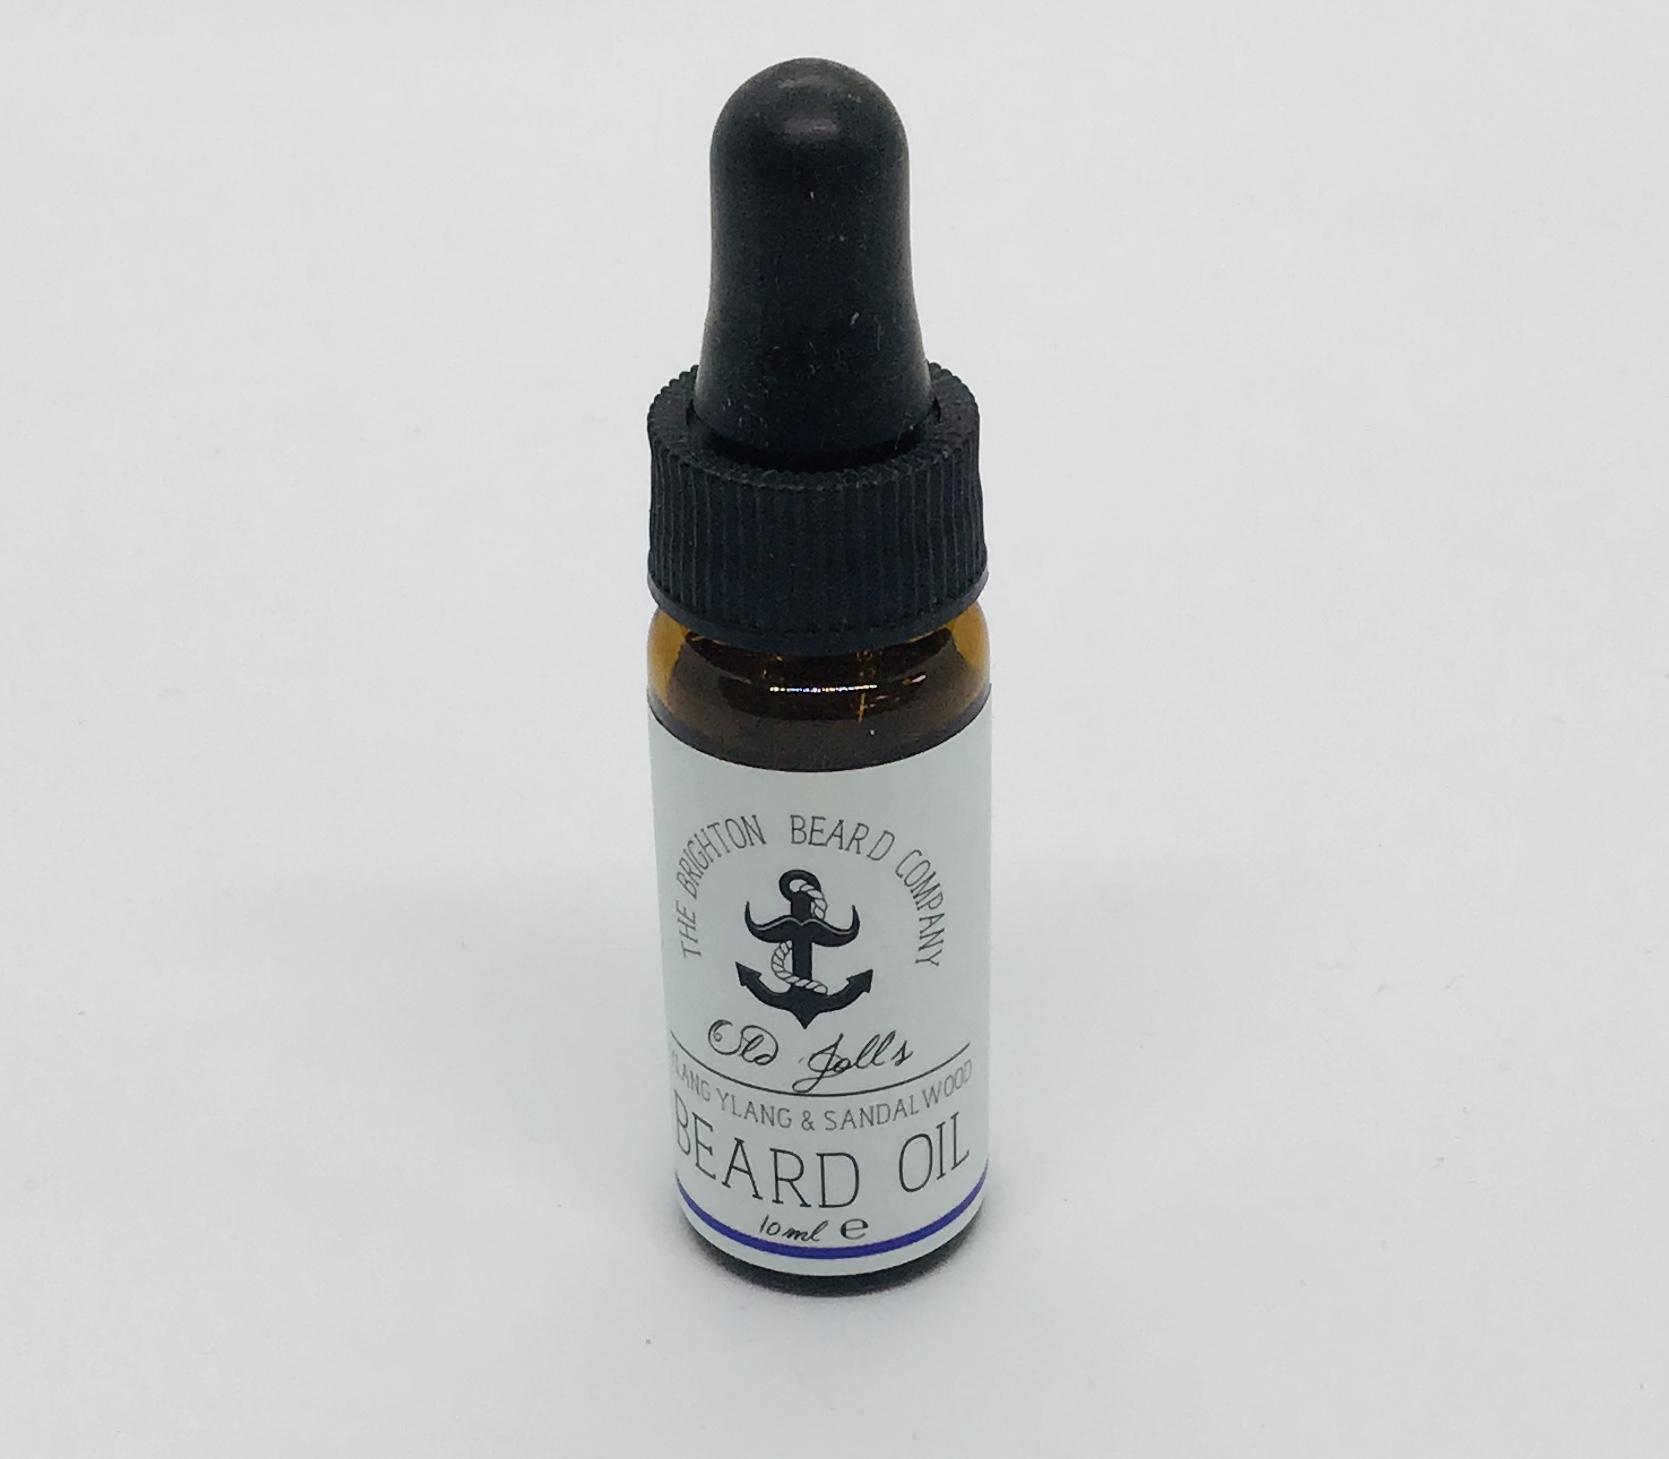 Brighton beard oil small